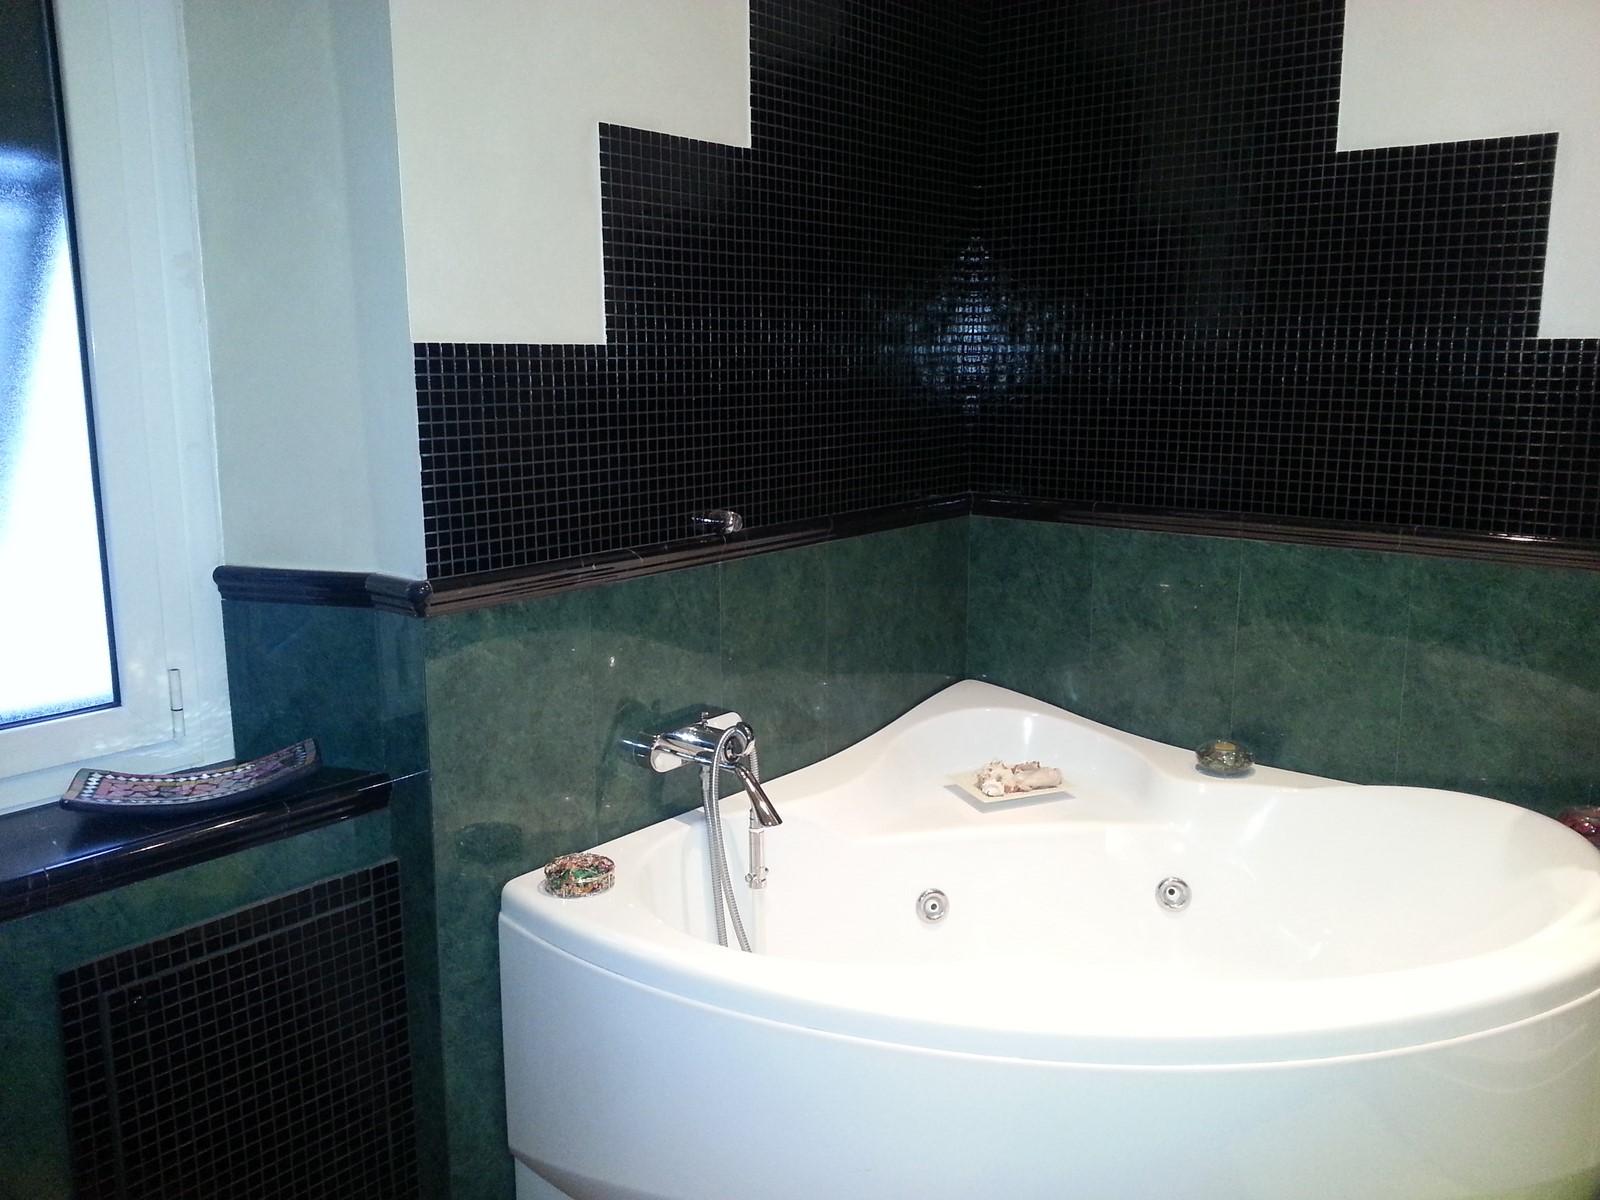 Rivestimento Bagno Mosaico Verde : Bagno con rivestimento in marmo verde alpi e mosaico in vetro nero